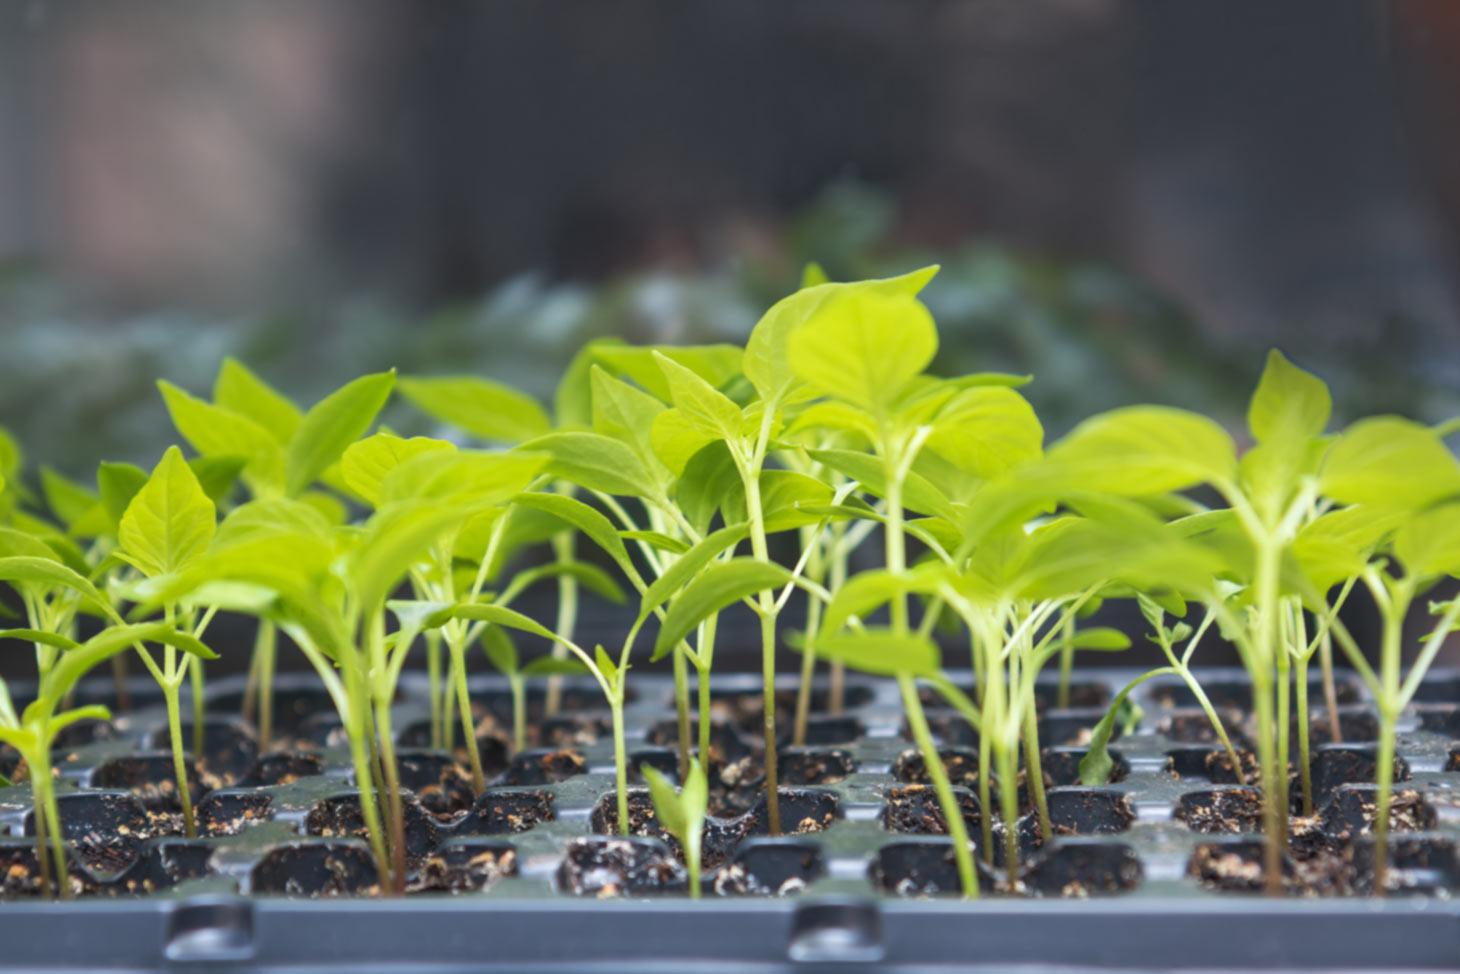 Junge Pflanzen in Topfplatten